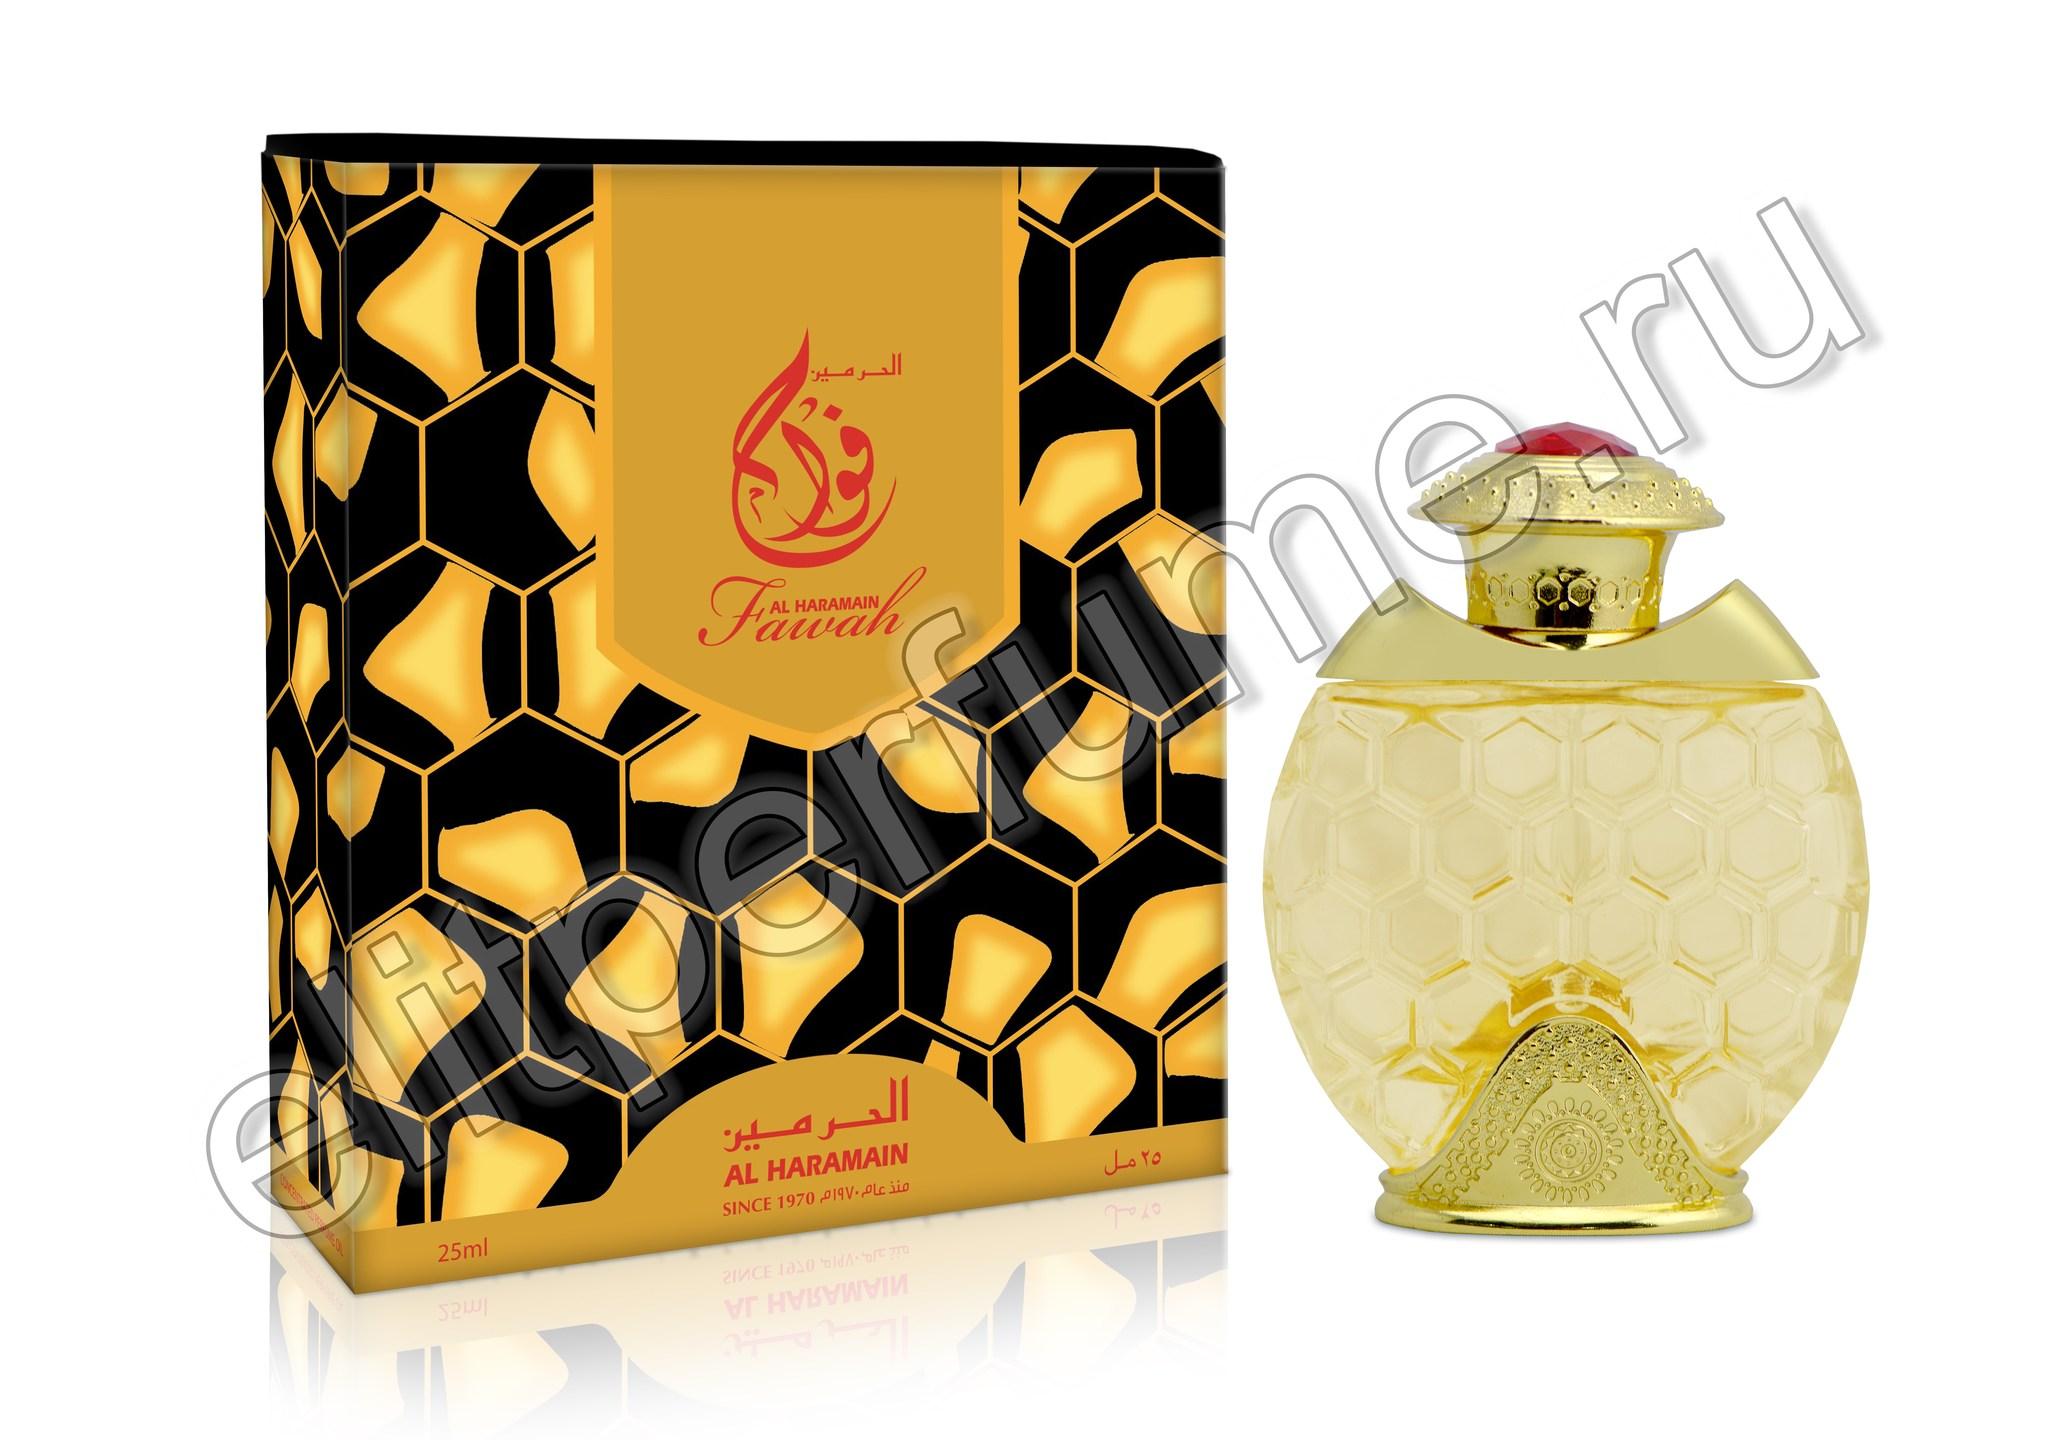 Al Haramain Fawah Аль Харамайн Фава 25 мл арабские масляные духи от Аль Харамайн Al Haramain Perfumes